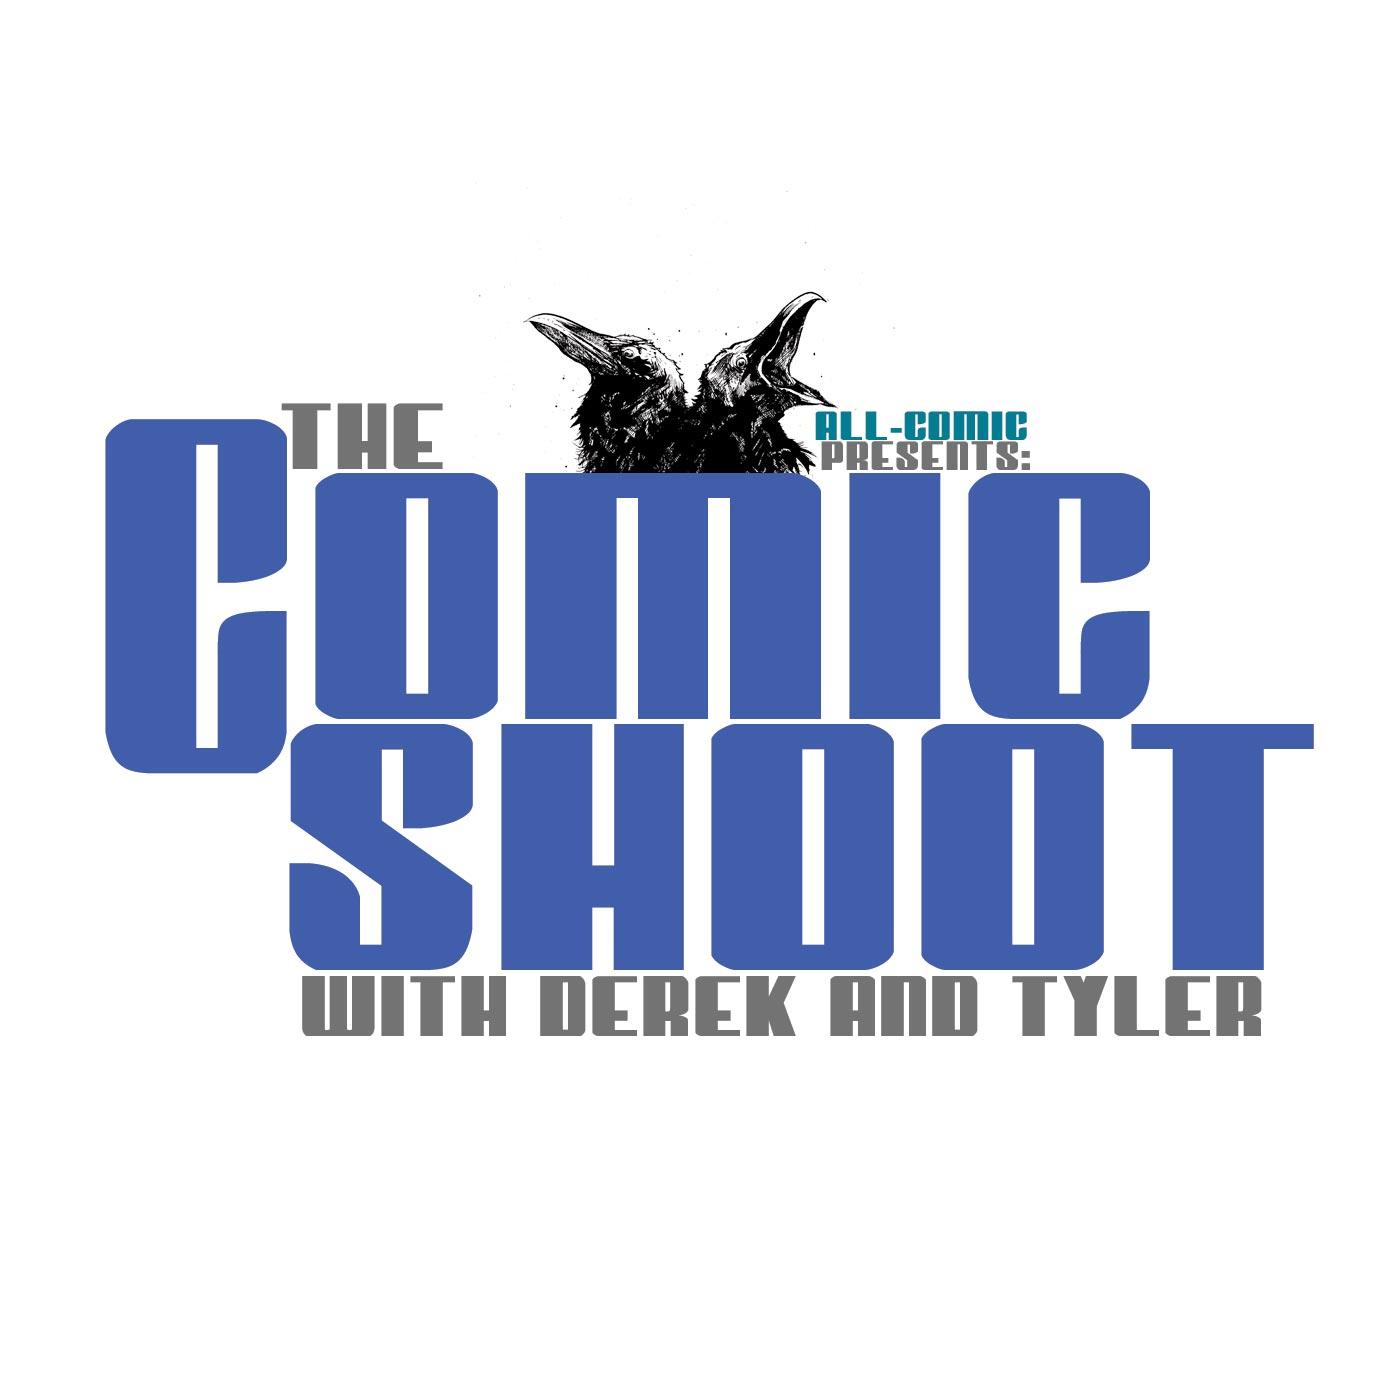 ComicShootV2